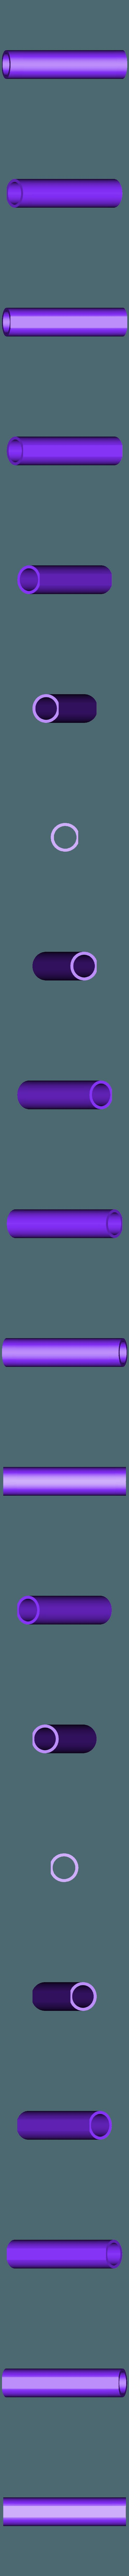 Barell_BR.stl Télécharger fichier STL gratuit Borderlands Bandit Room Clener Shotgun • Modèle pour impression 3D, Dsk